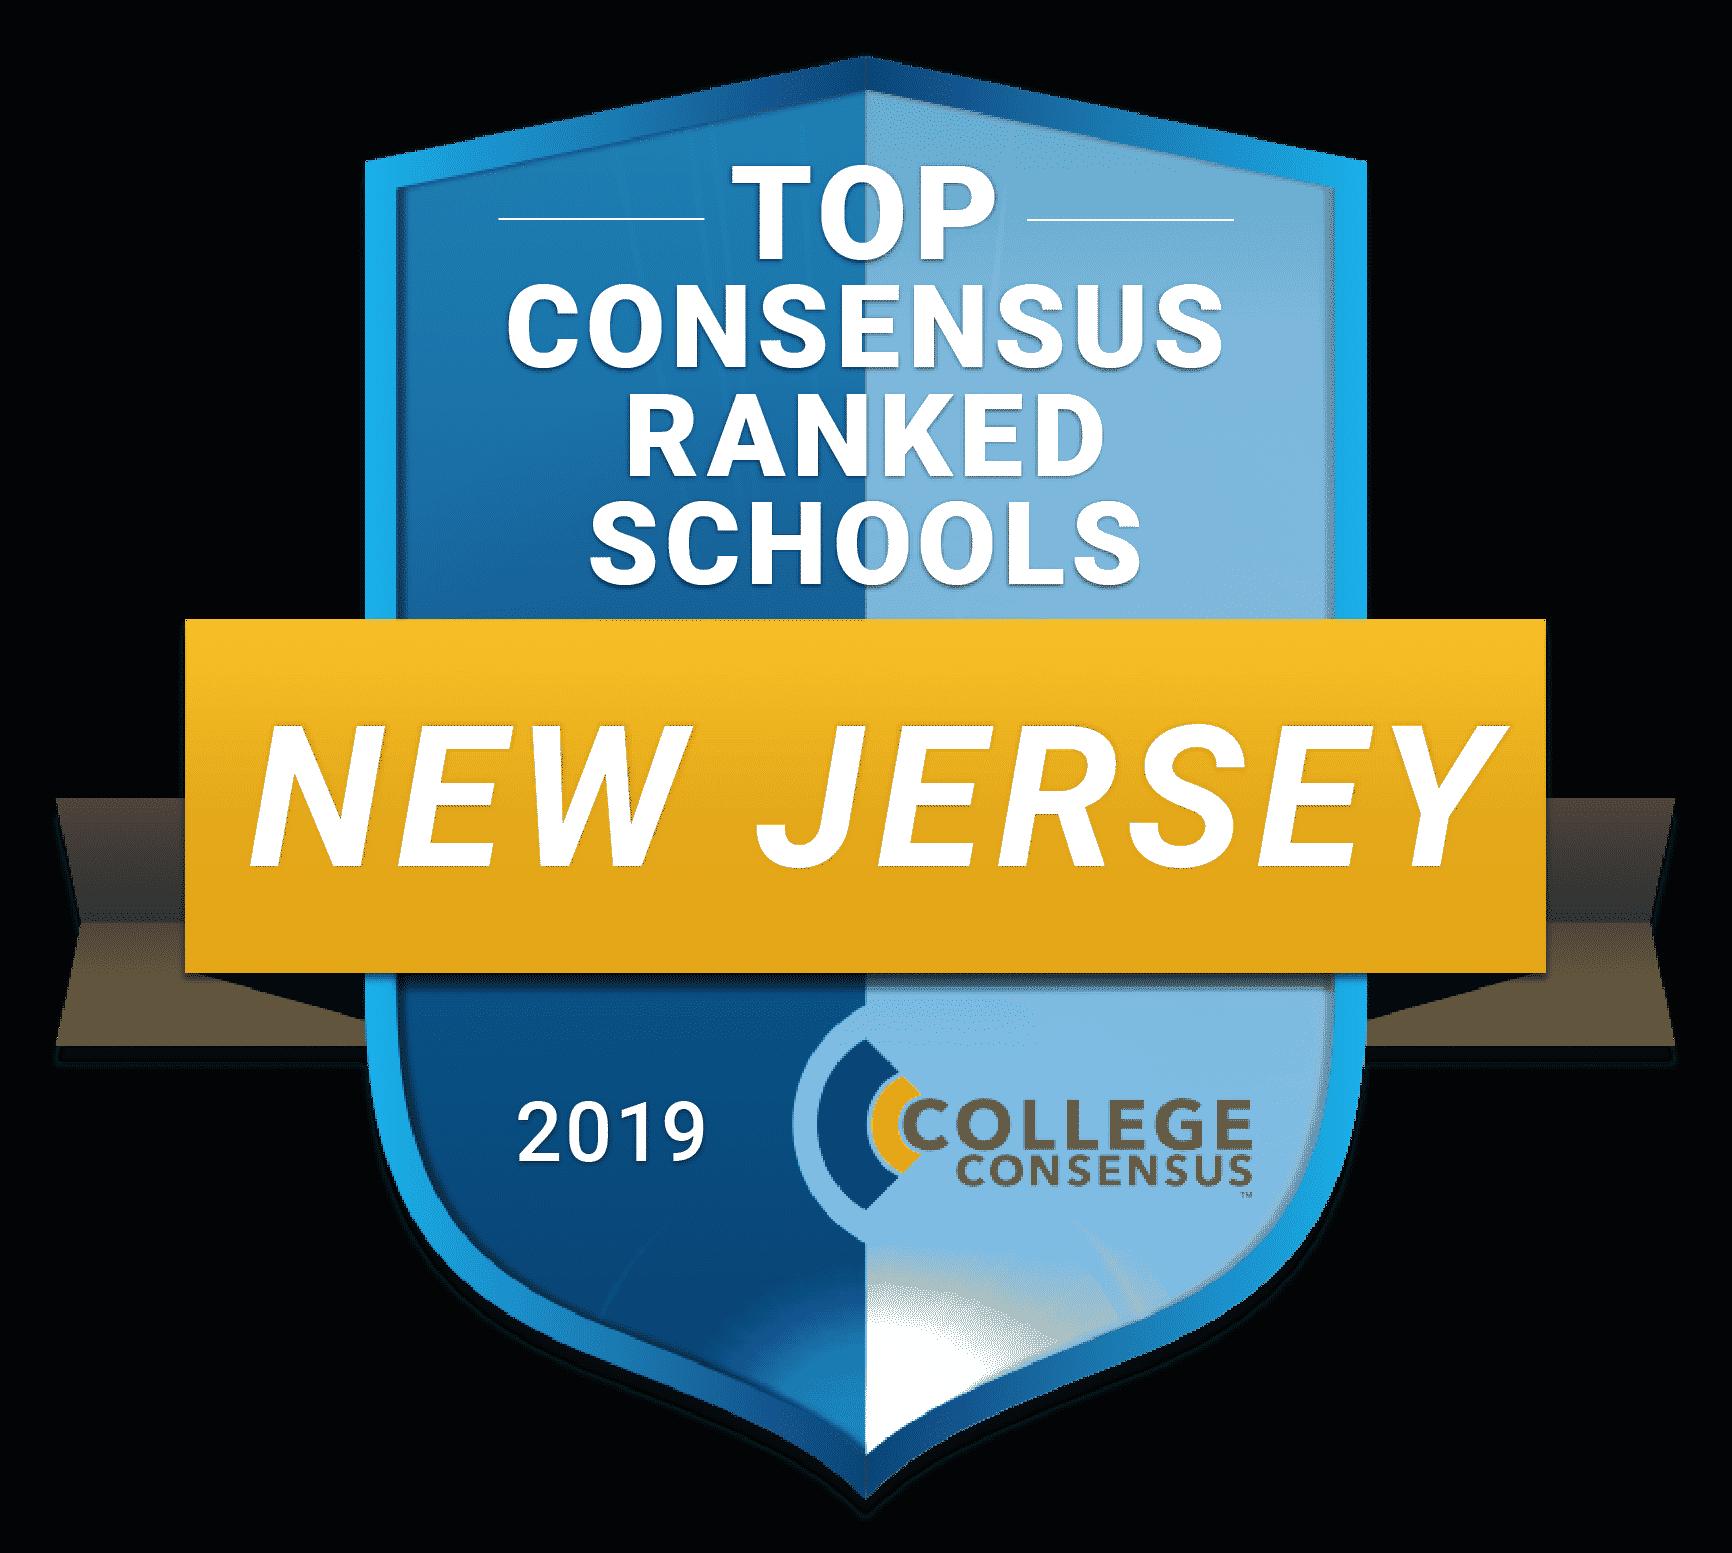 Consensus Ranked NJ new jersey 2019